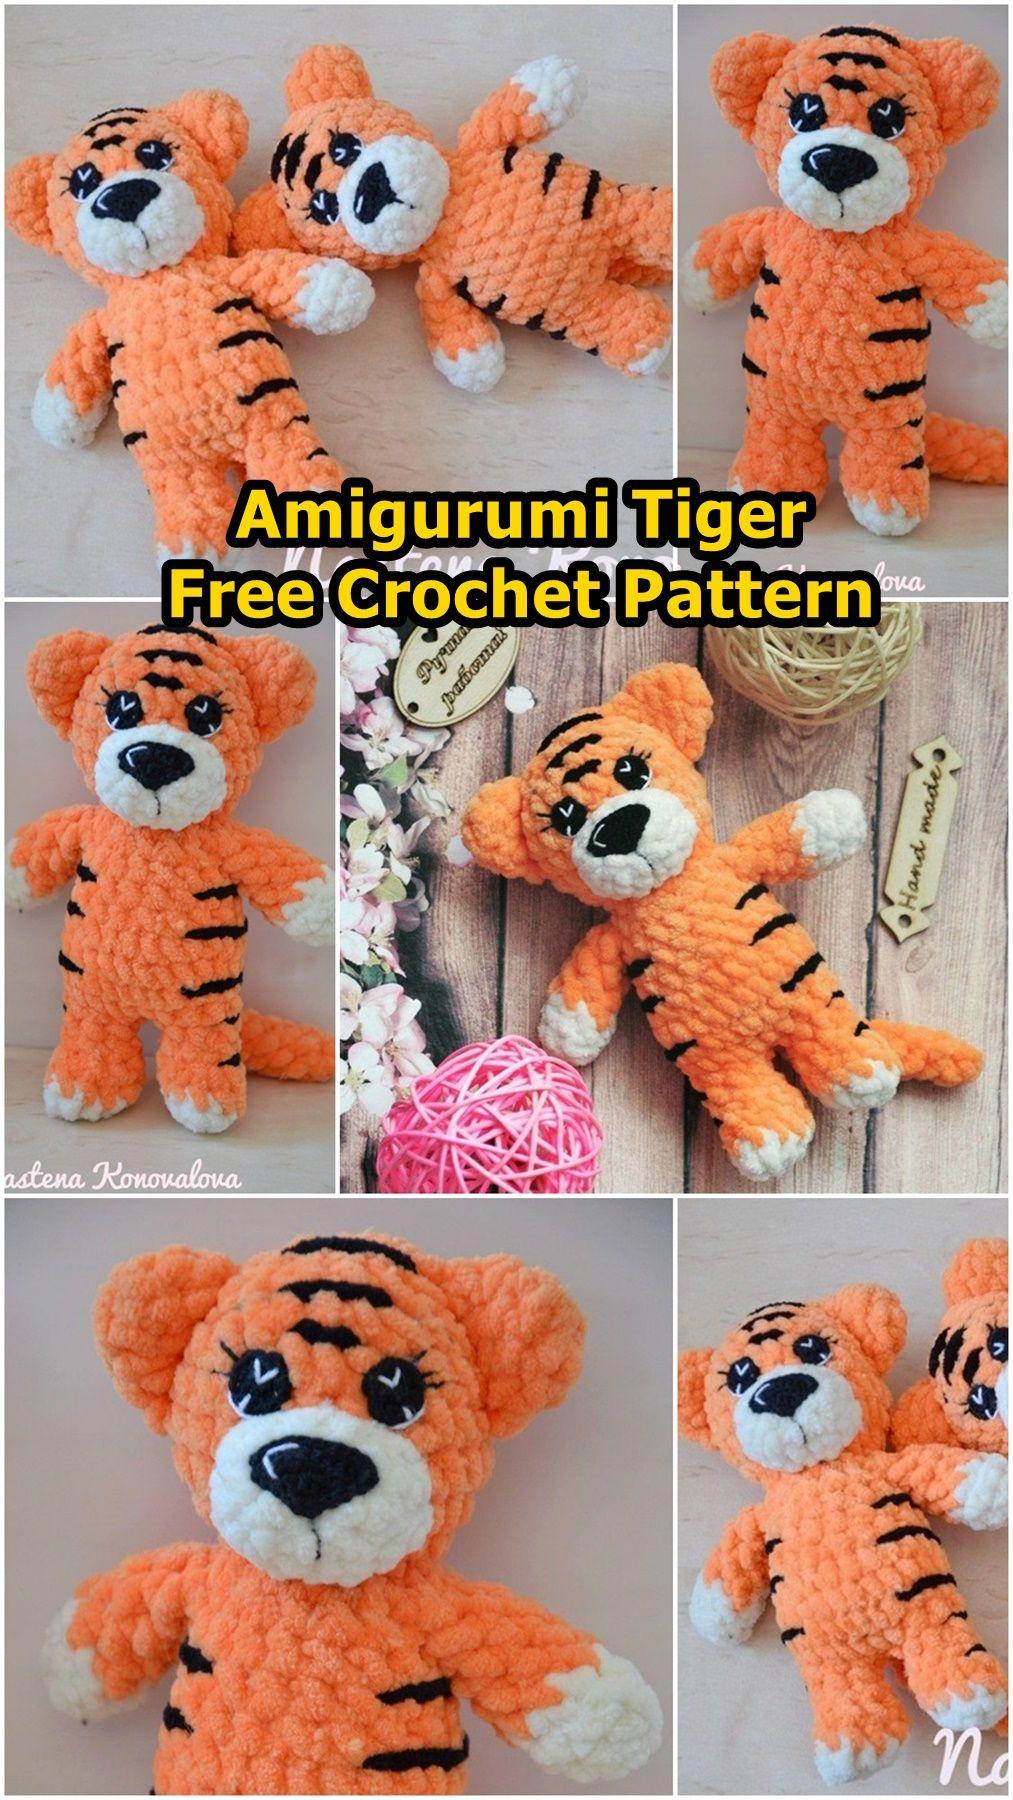 14 Best Amigurumi Tigers images | Amigurumi, Crochet patterns ... | 1800x1013